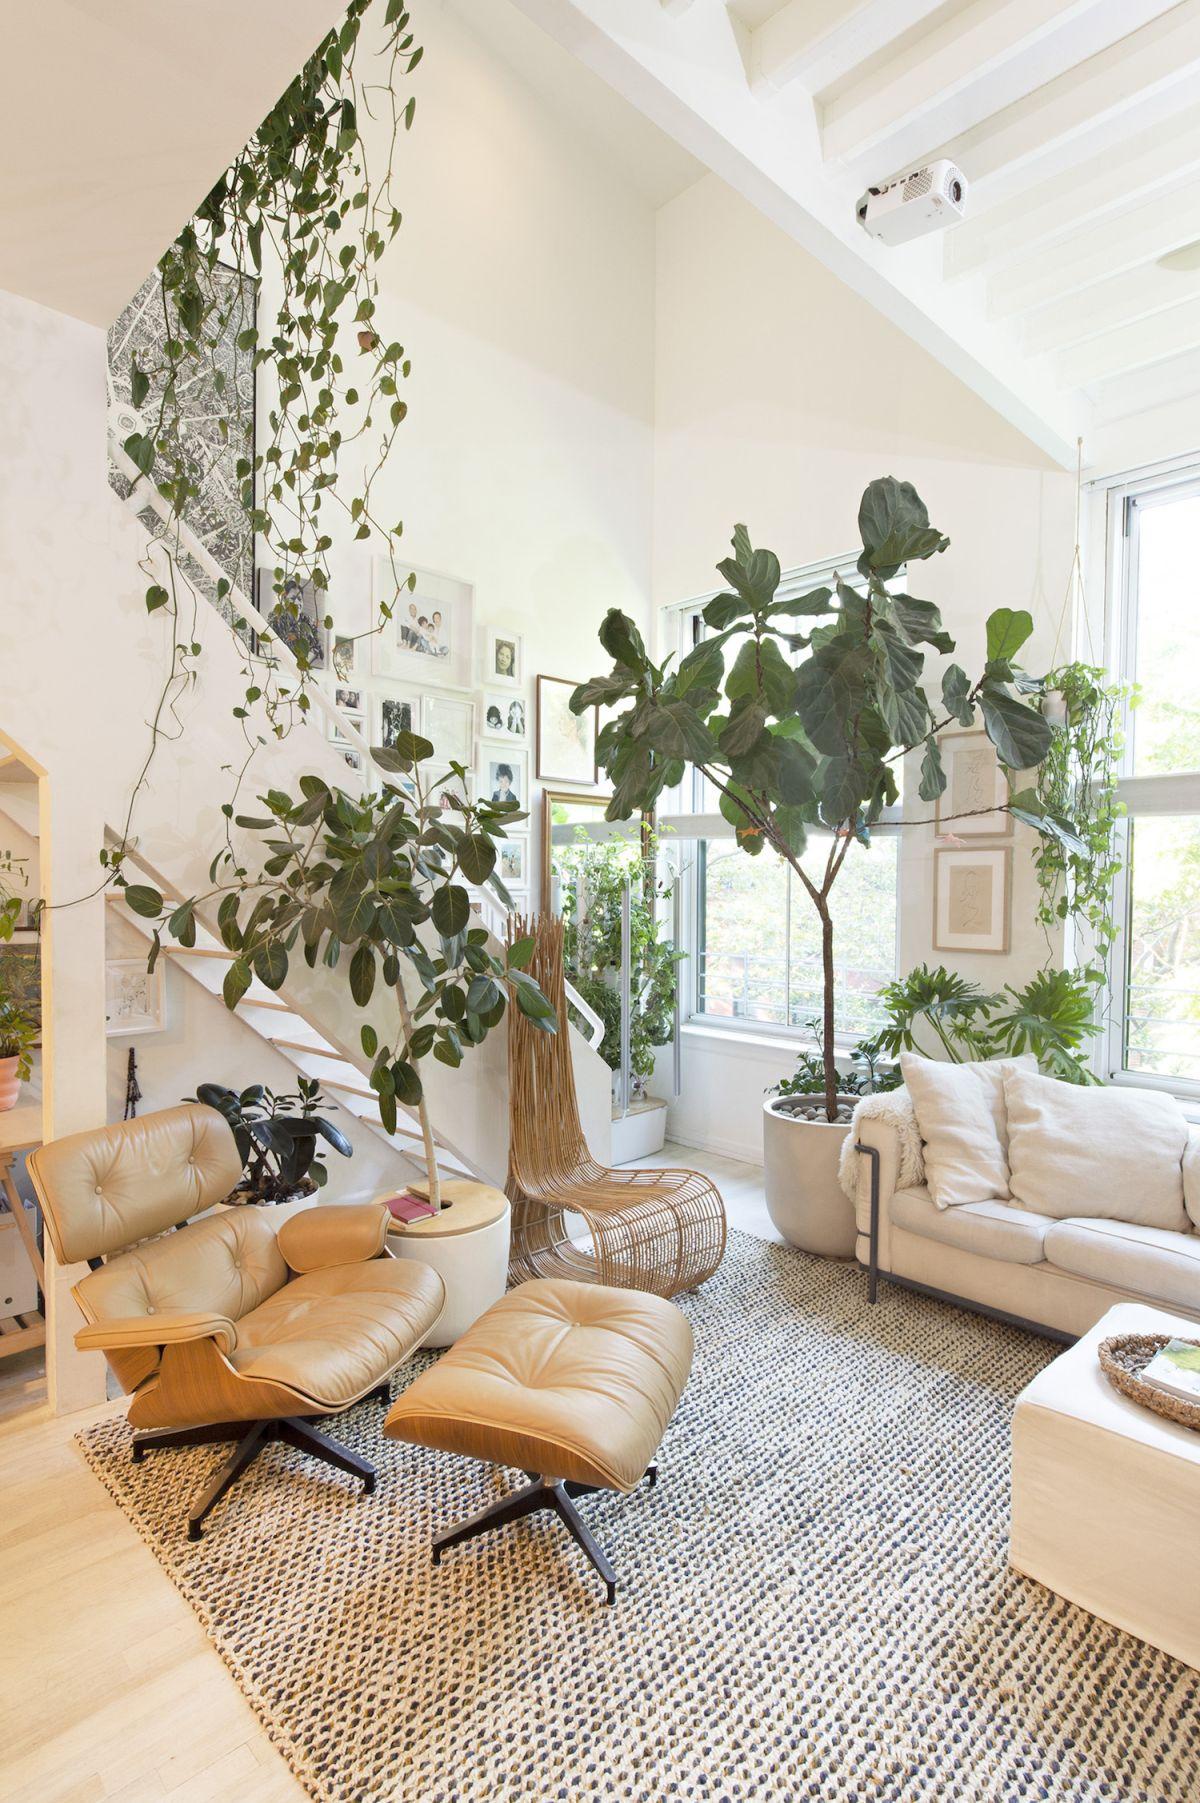 Step inside an architect's tiny loft apartment in Brooklyn